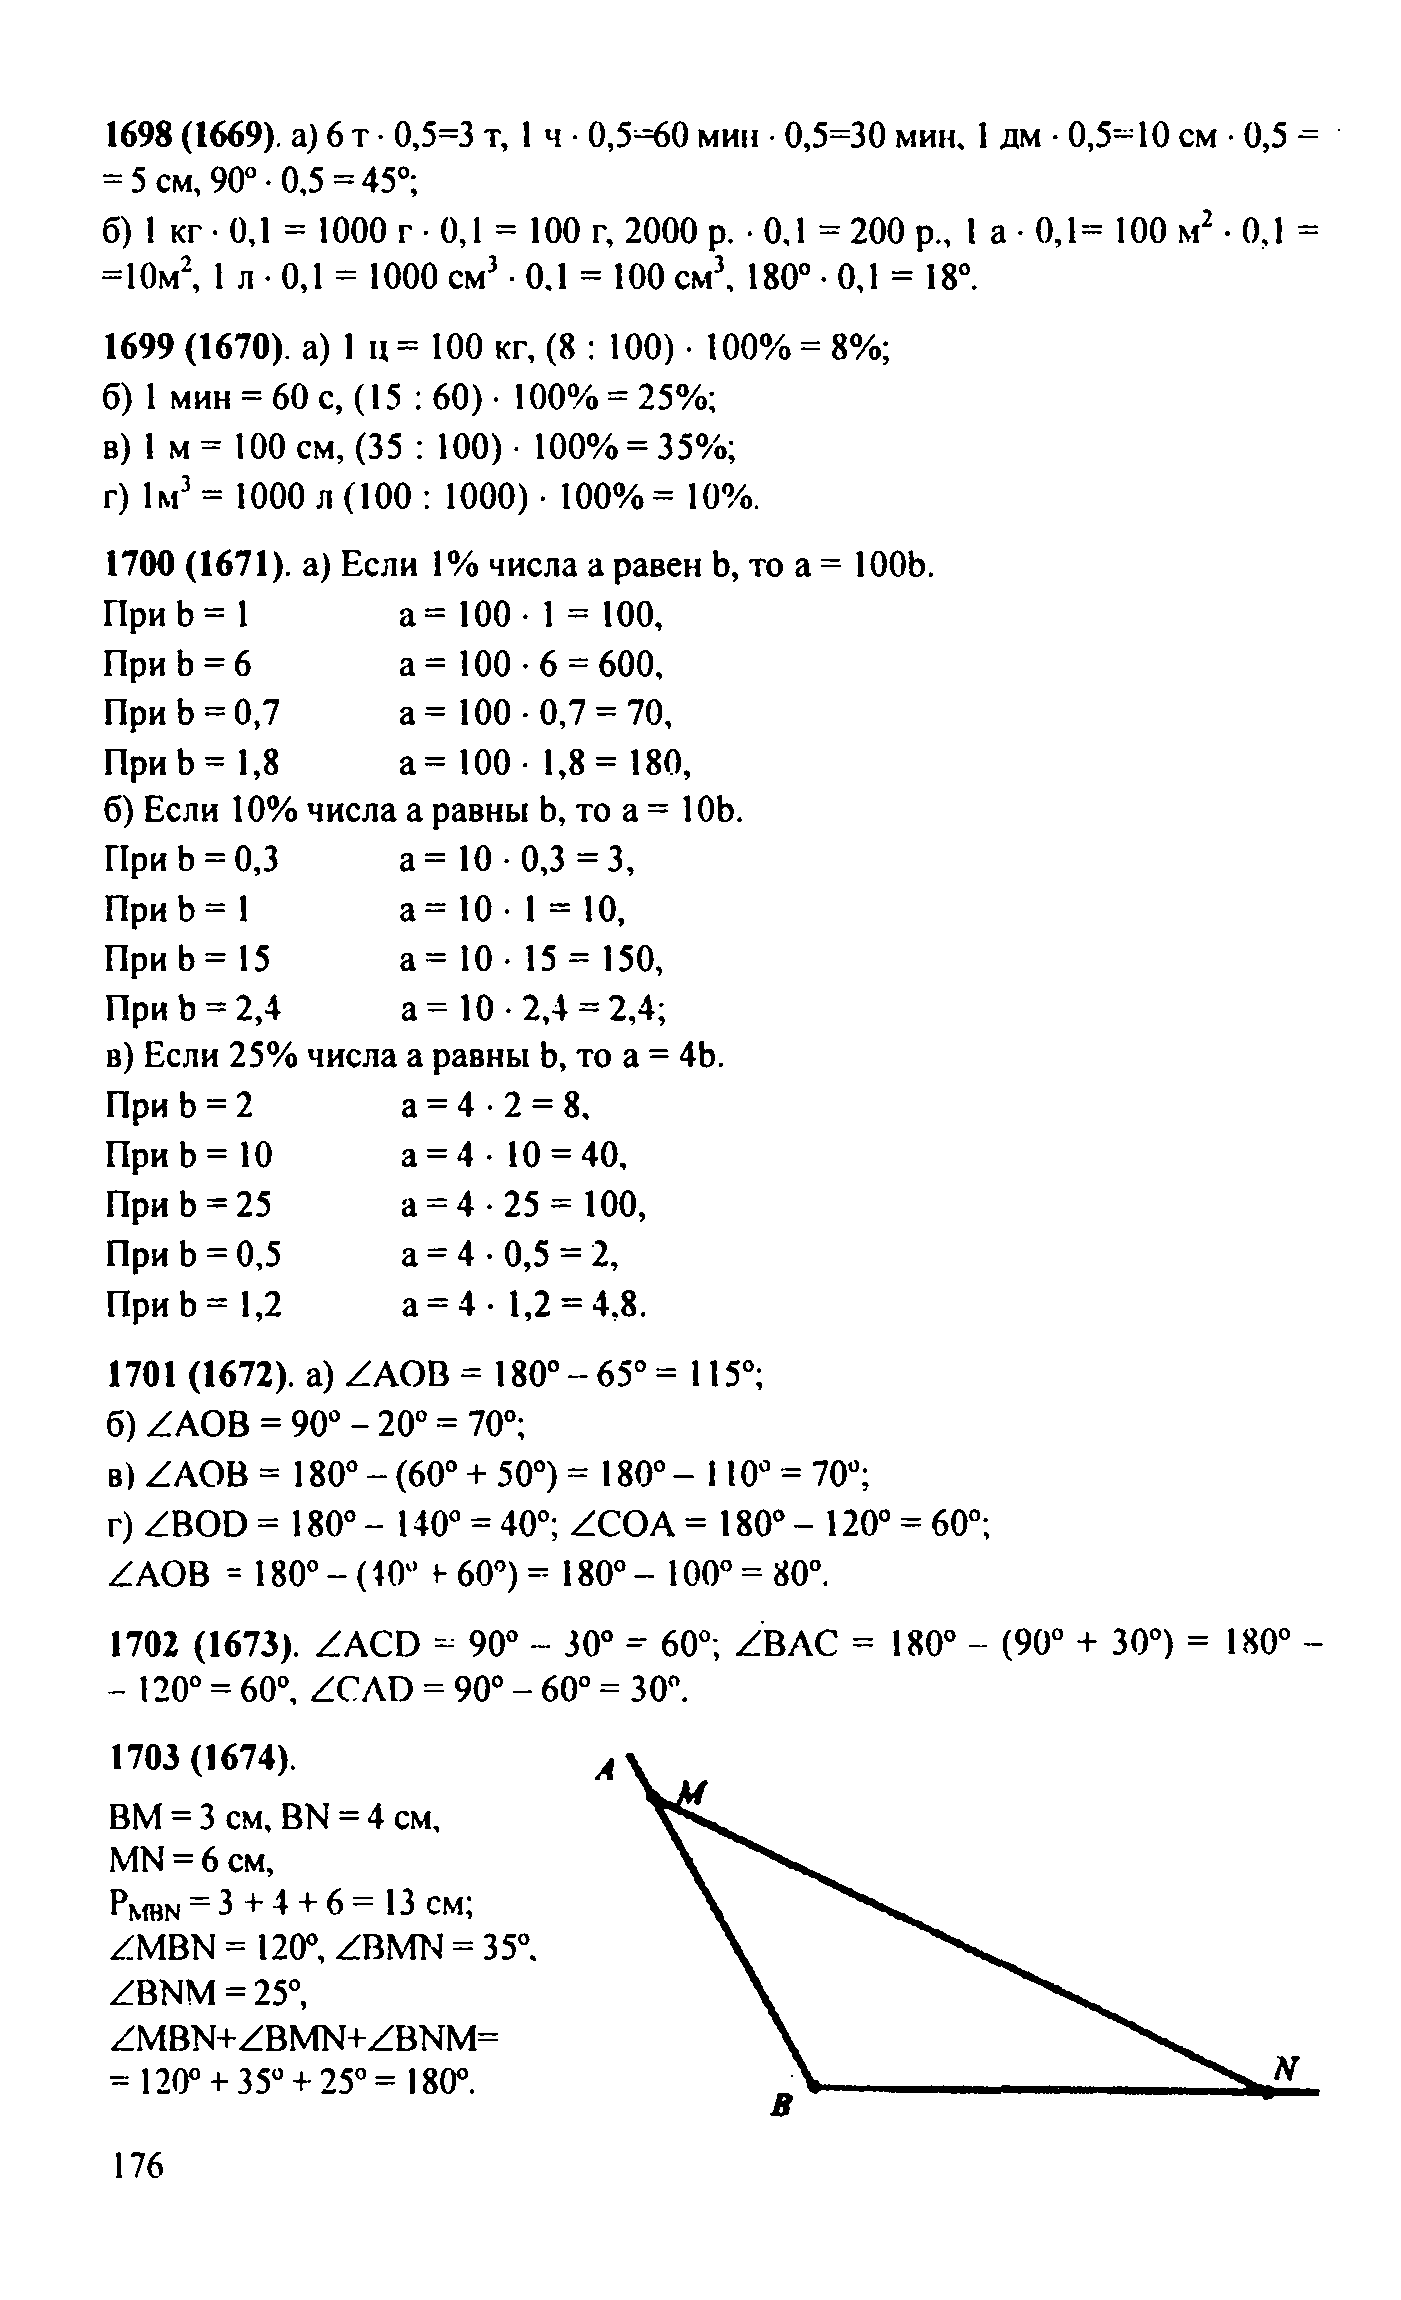 Решебник По Математике Н.я. Виленкин 5 Класс Гдз 2004